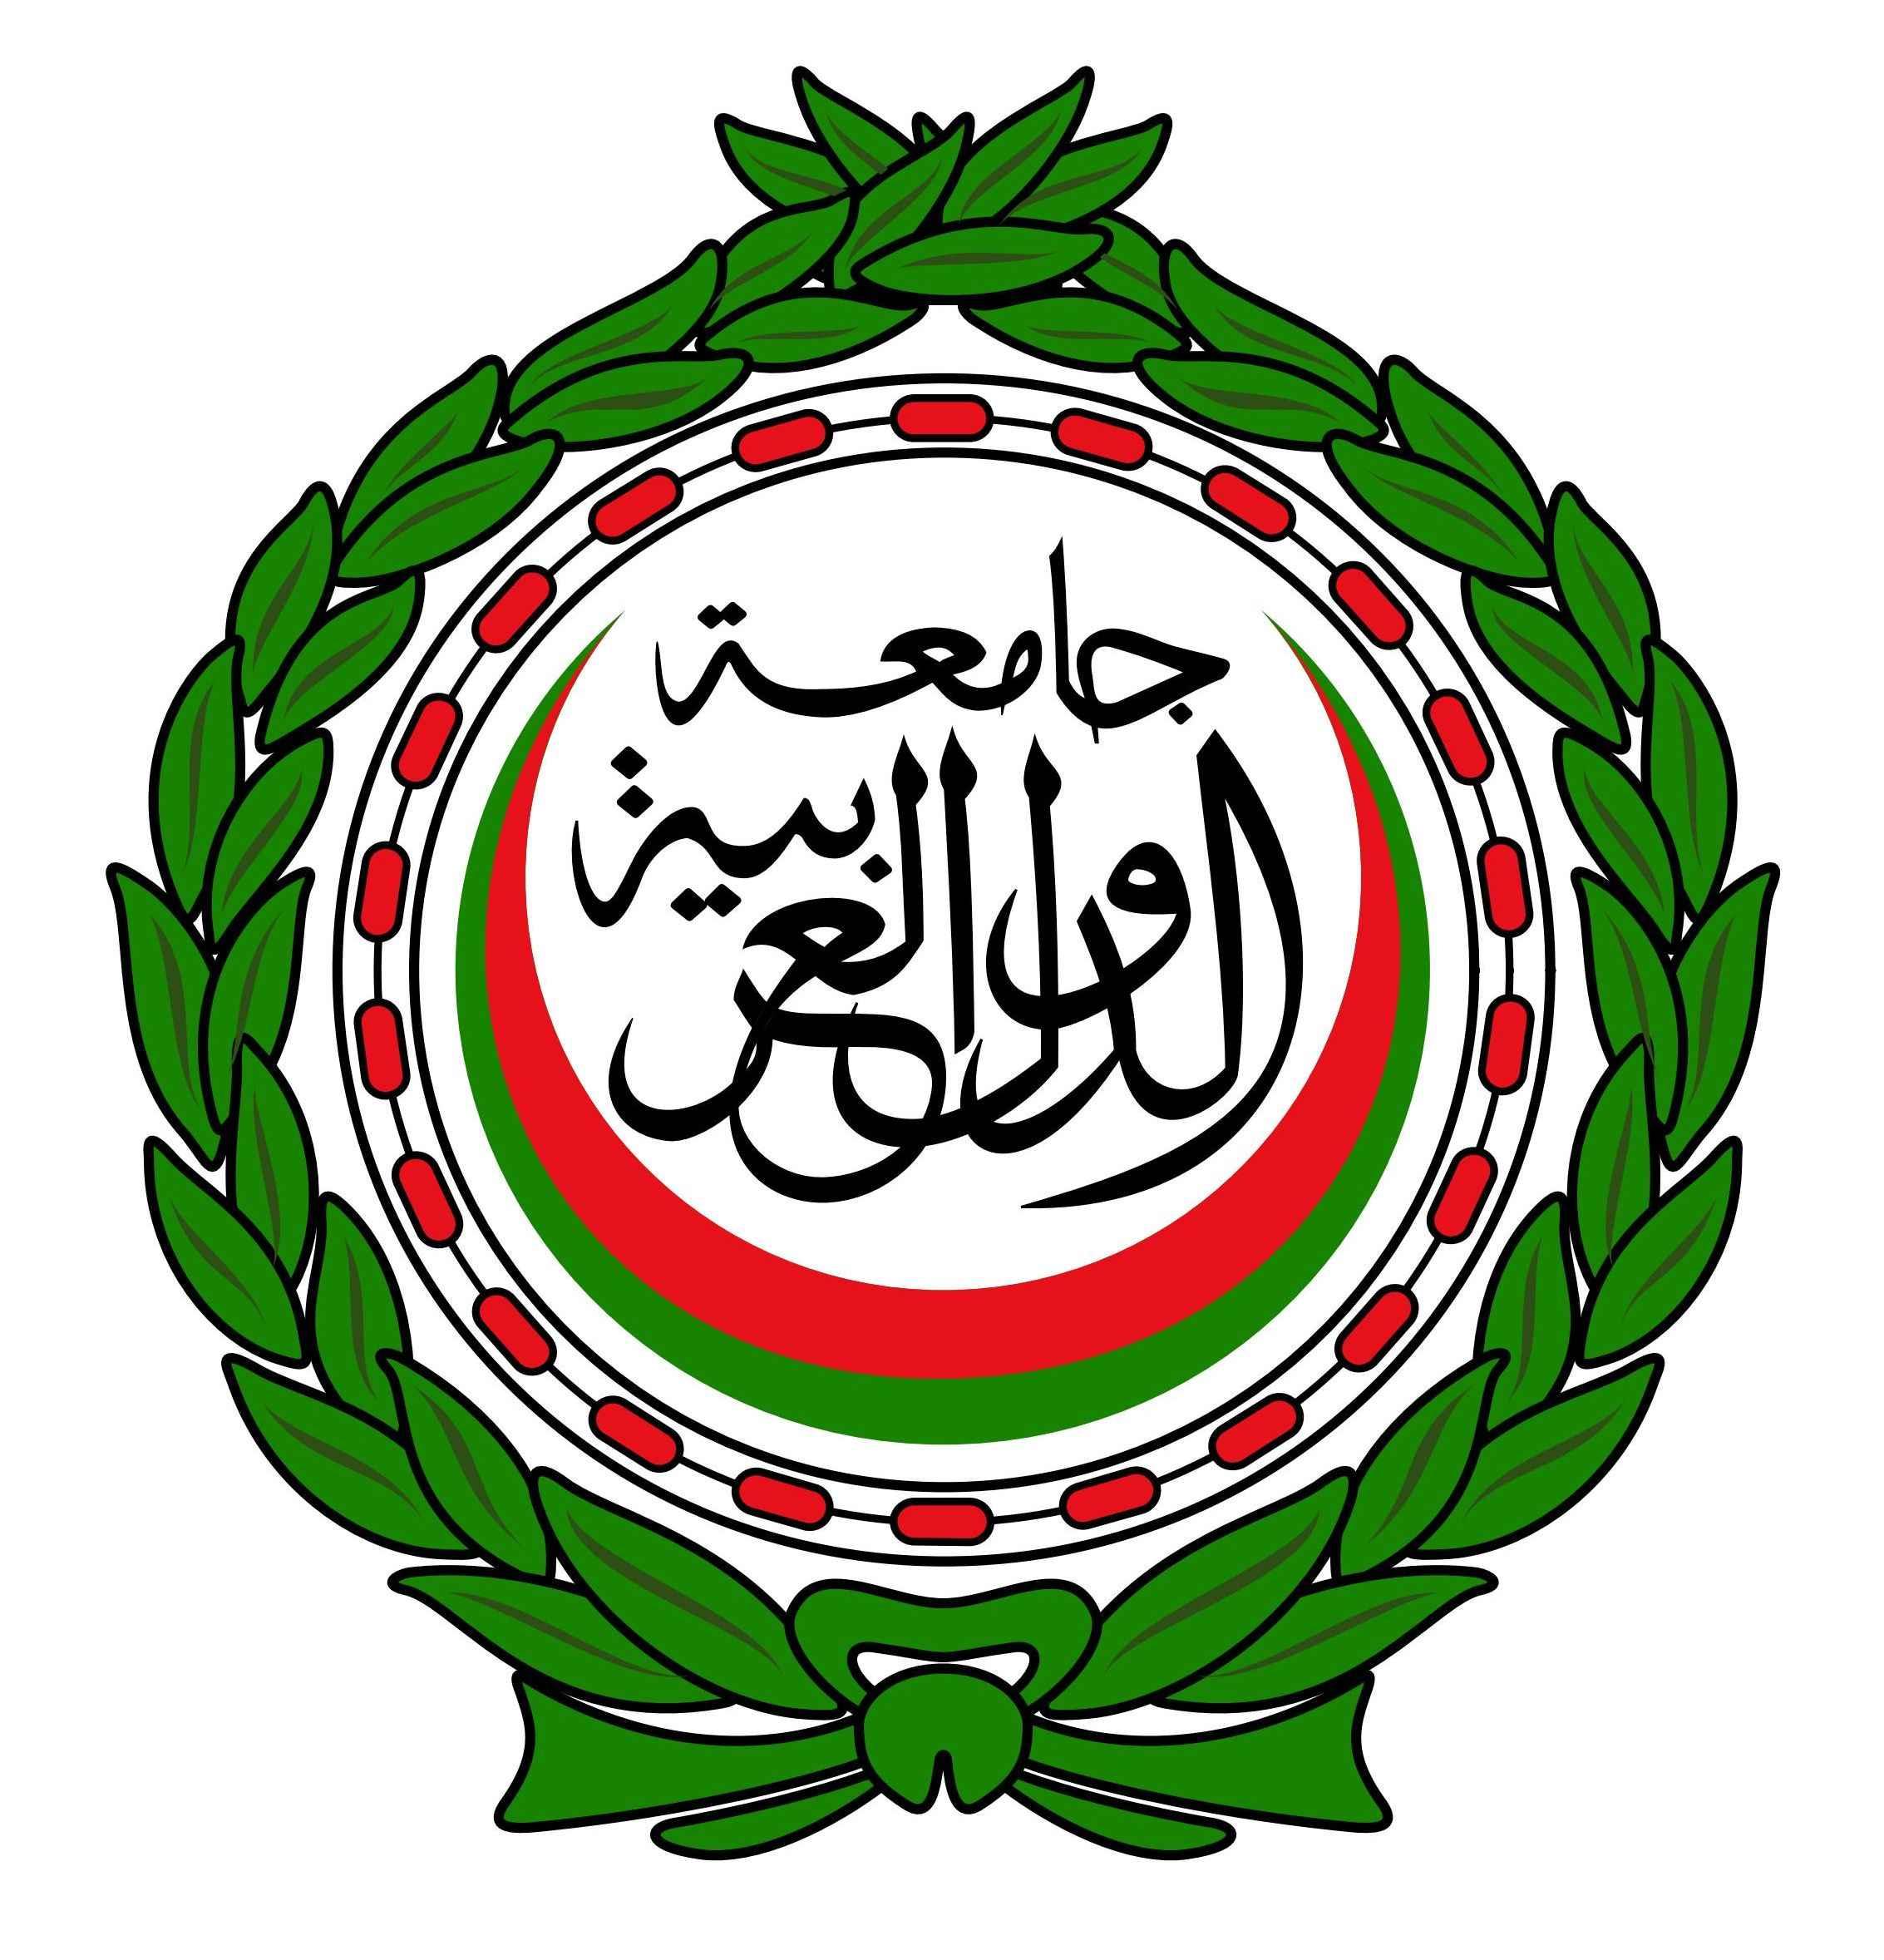 Arab League Emblem&Arm [EPS-PDF] Vector EPS Free Download, Logo, Icons, Brand Emblems